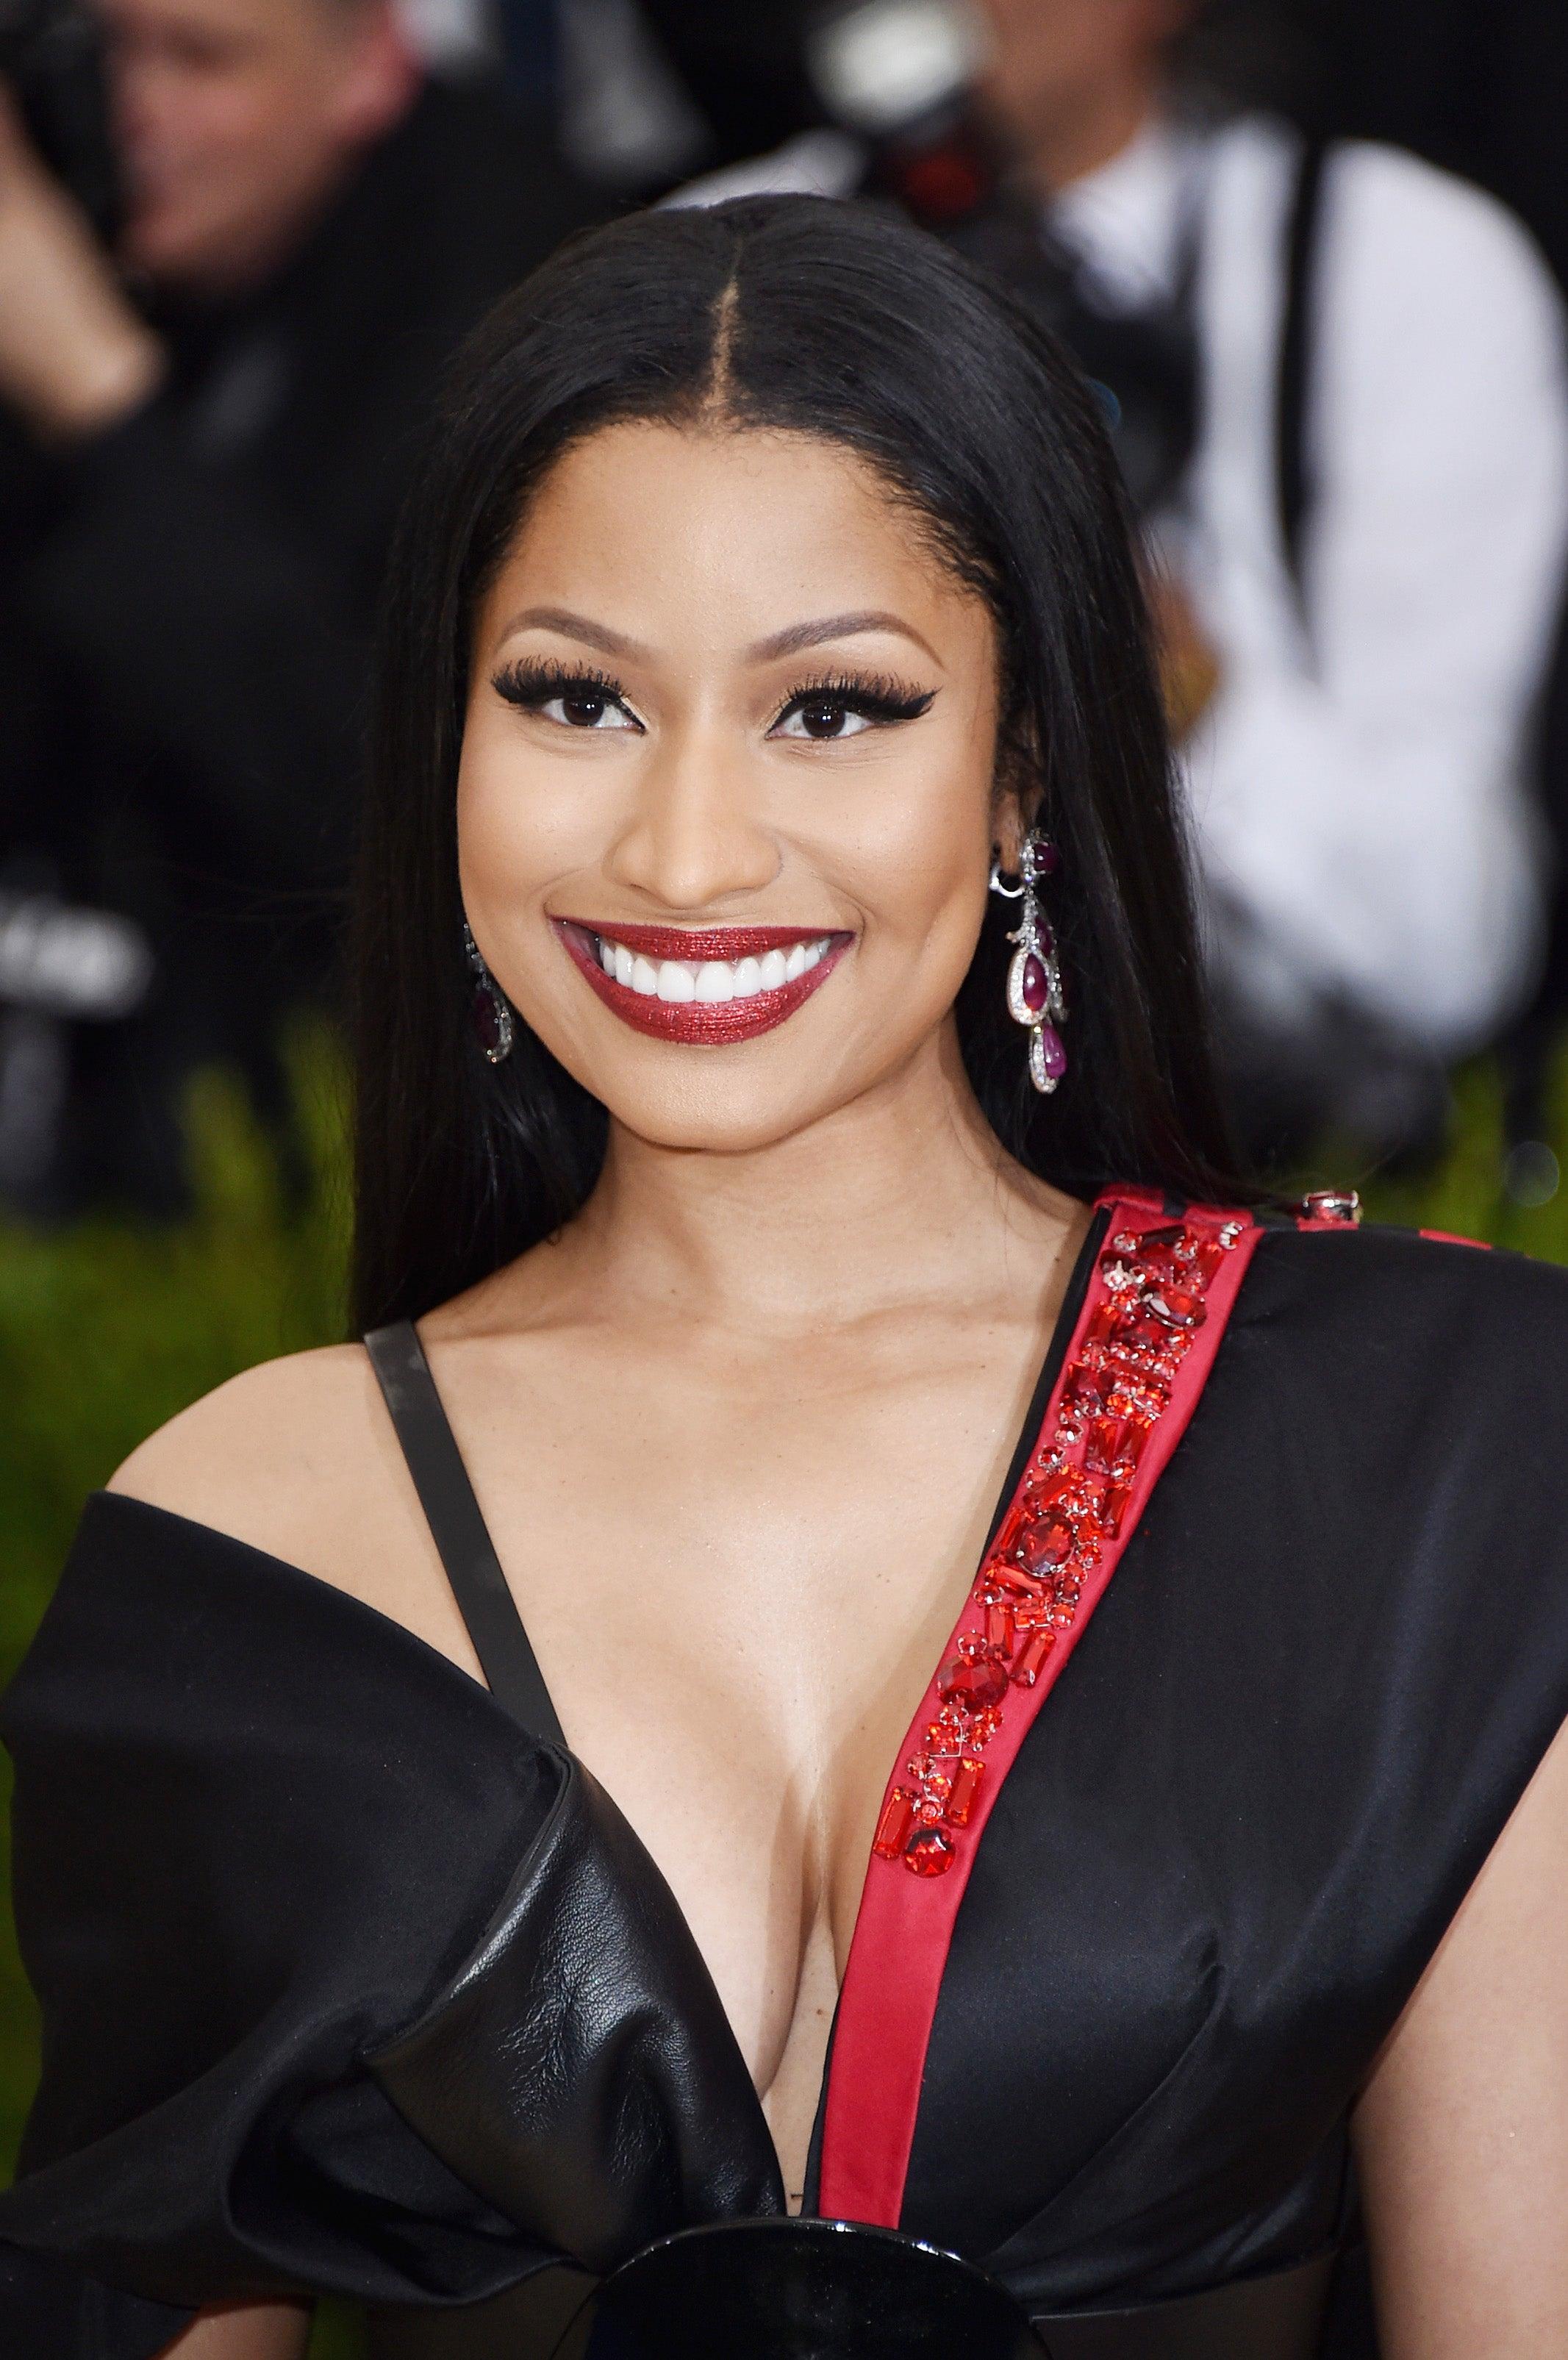 Nicki Minaj To Launch Charity To Help With Student Loans